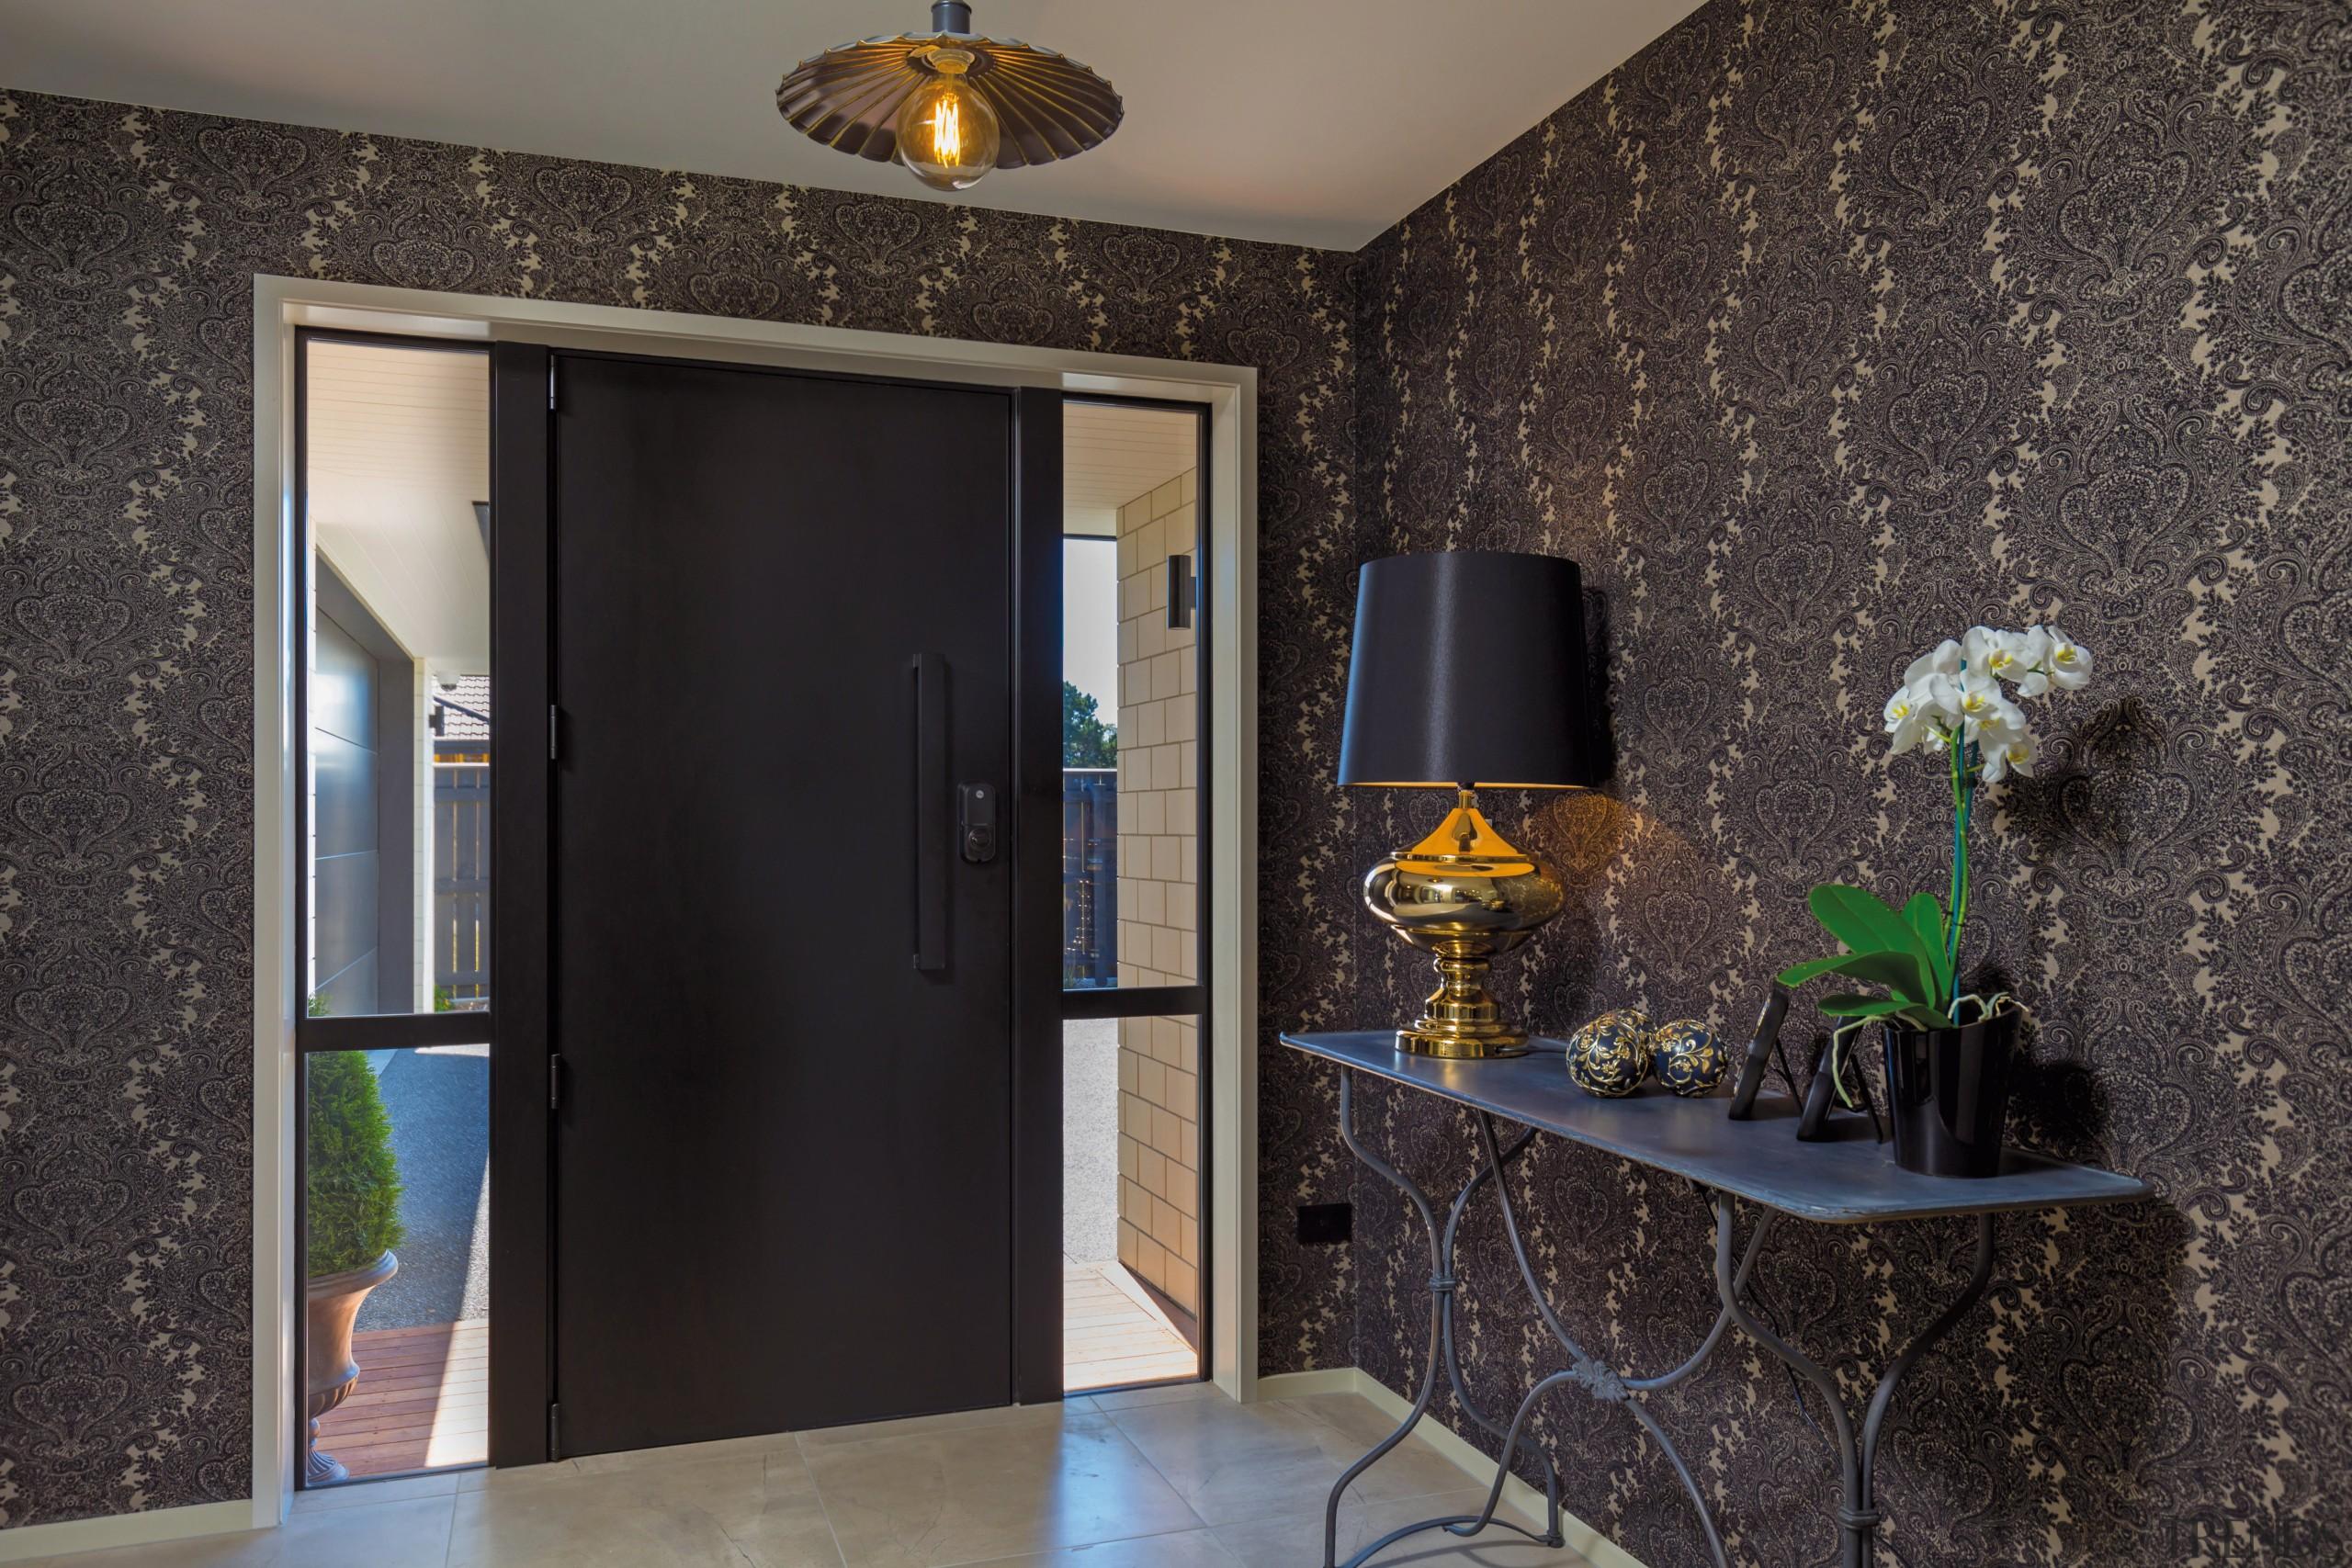 This spacious entry hall in the GJ Gardner door, floor, flooring, home, interior design, room, wall, black, gray